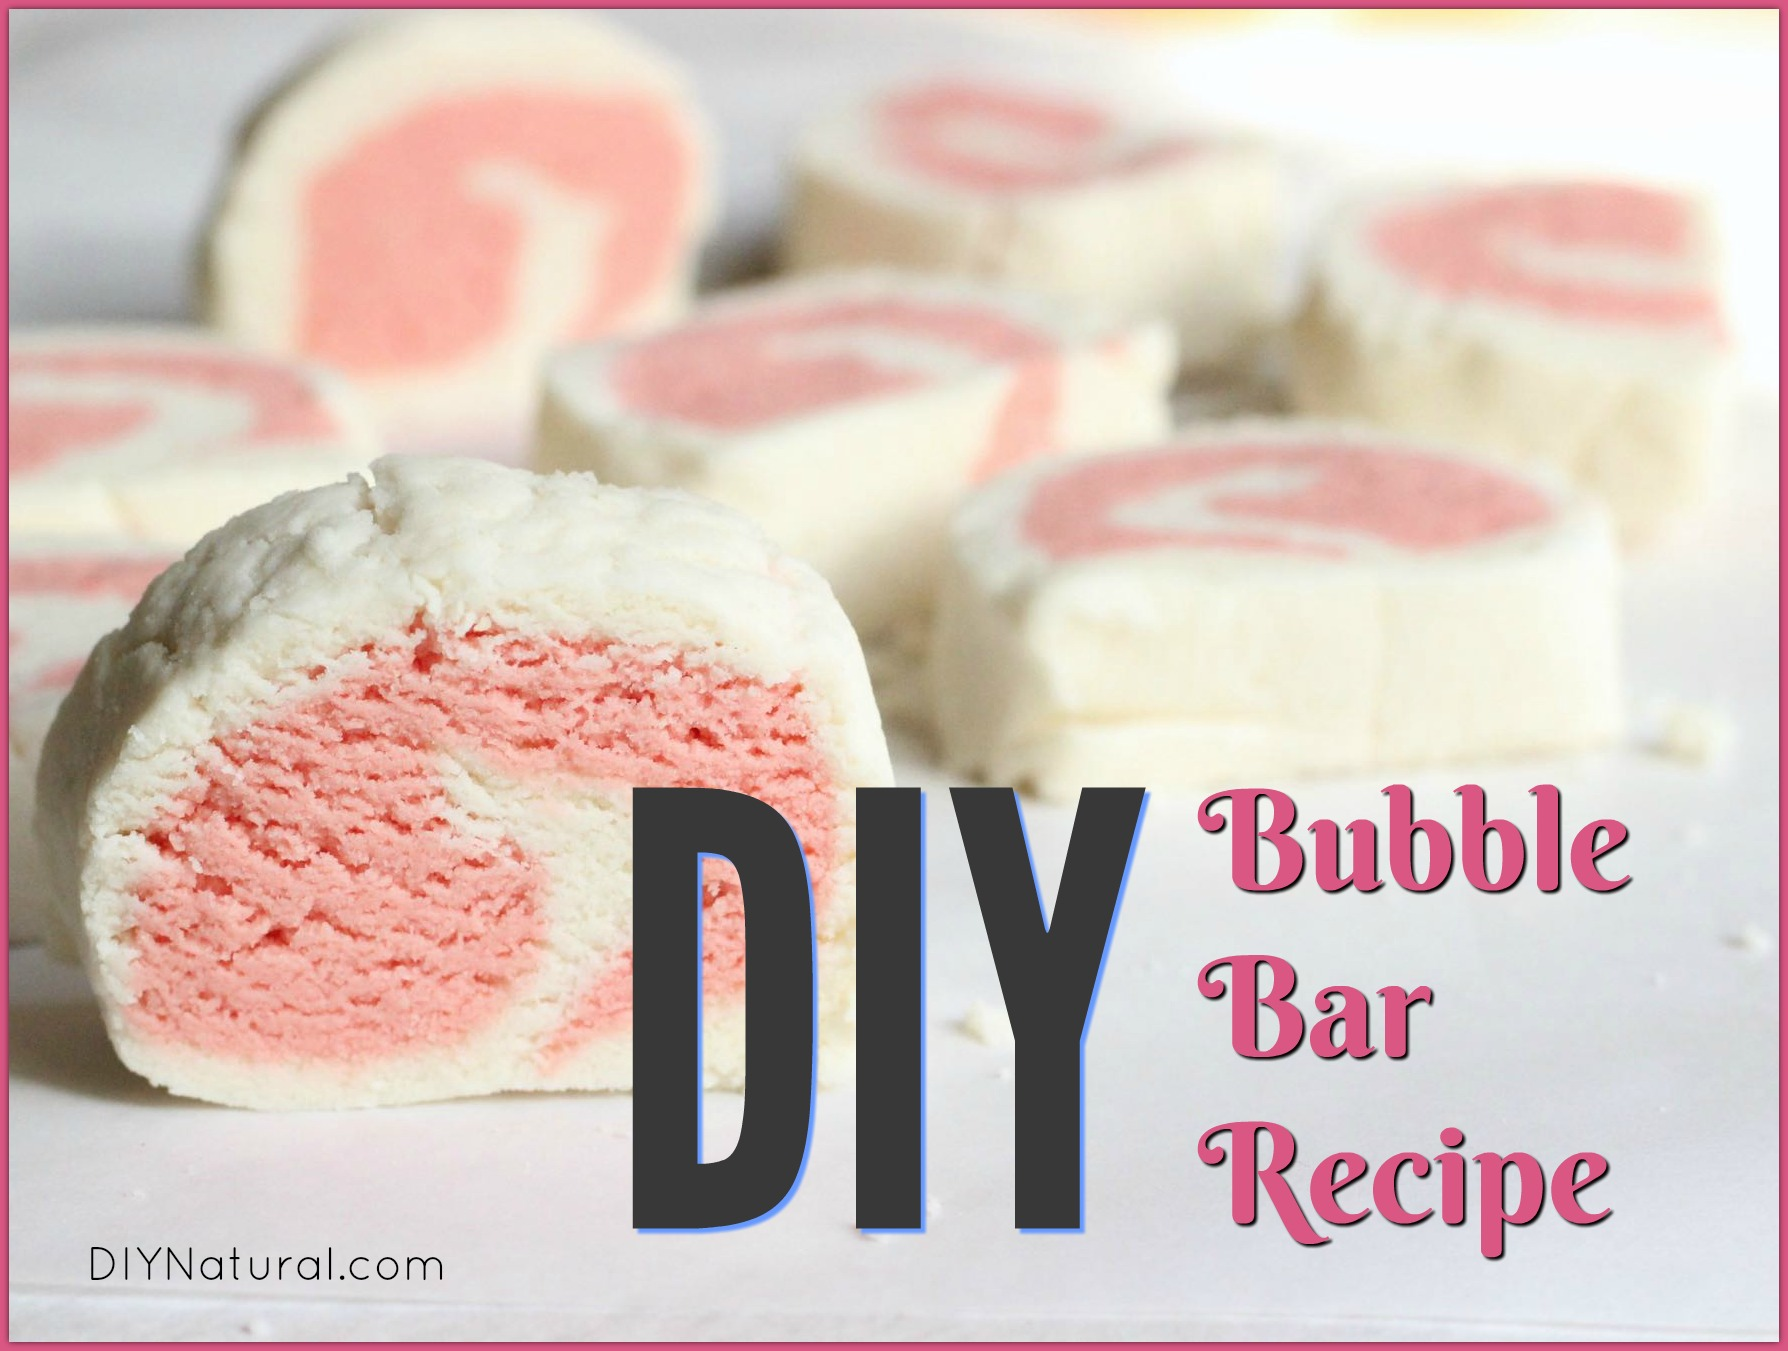 Diy bubble bar recipe make your own natural bubble bath bars for Home made bubble bath